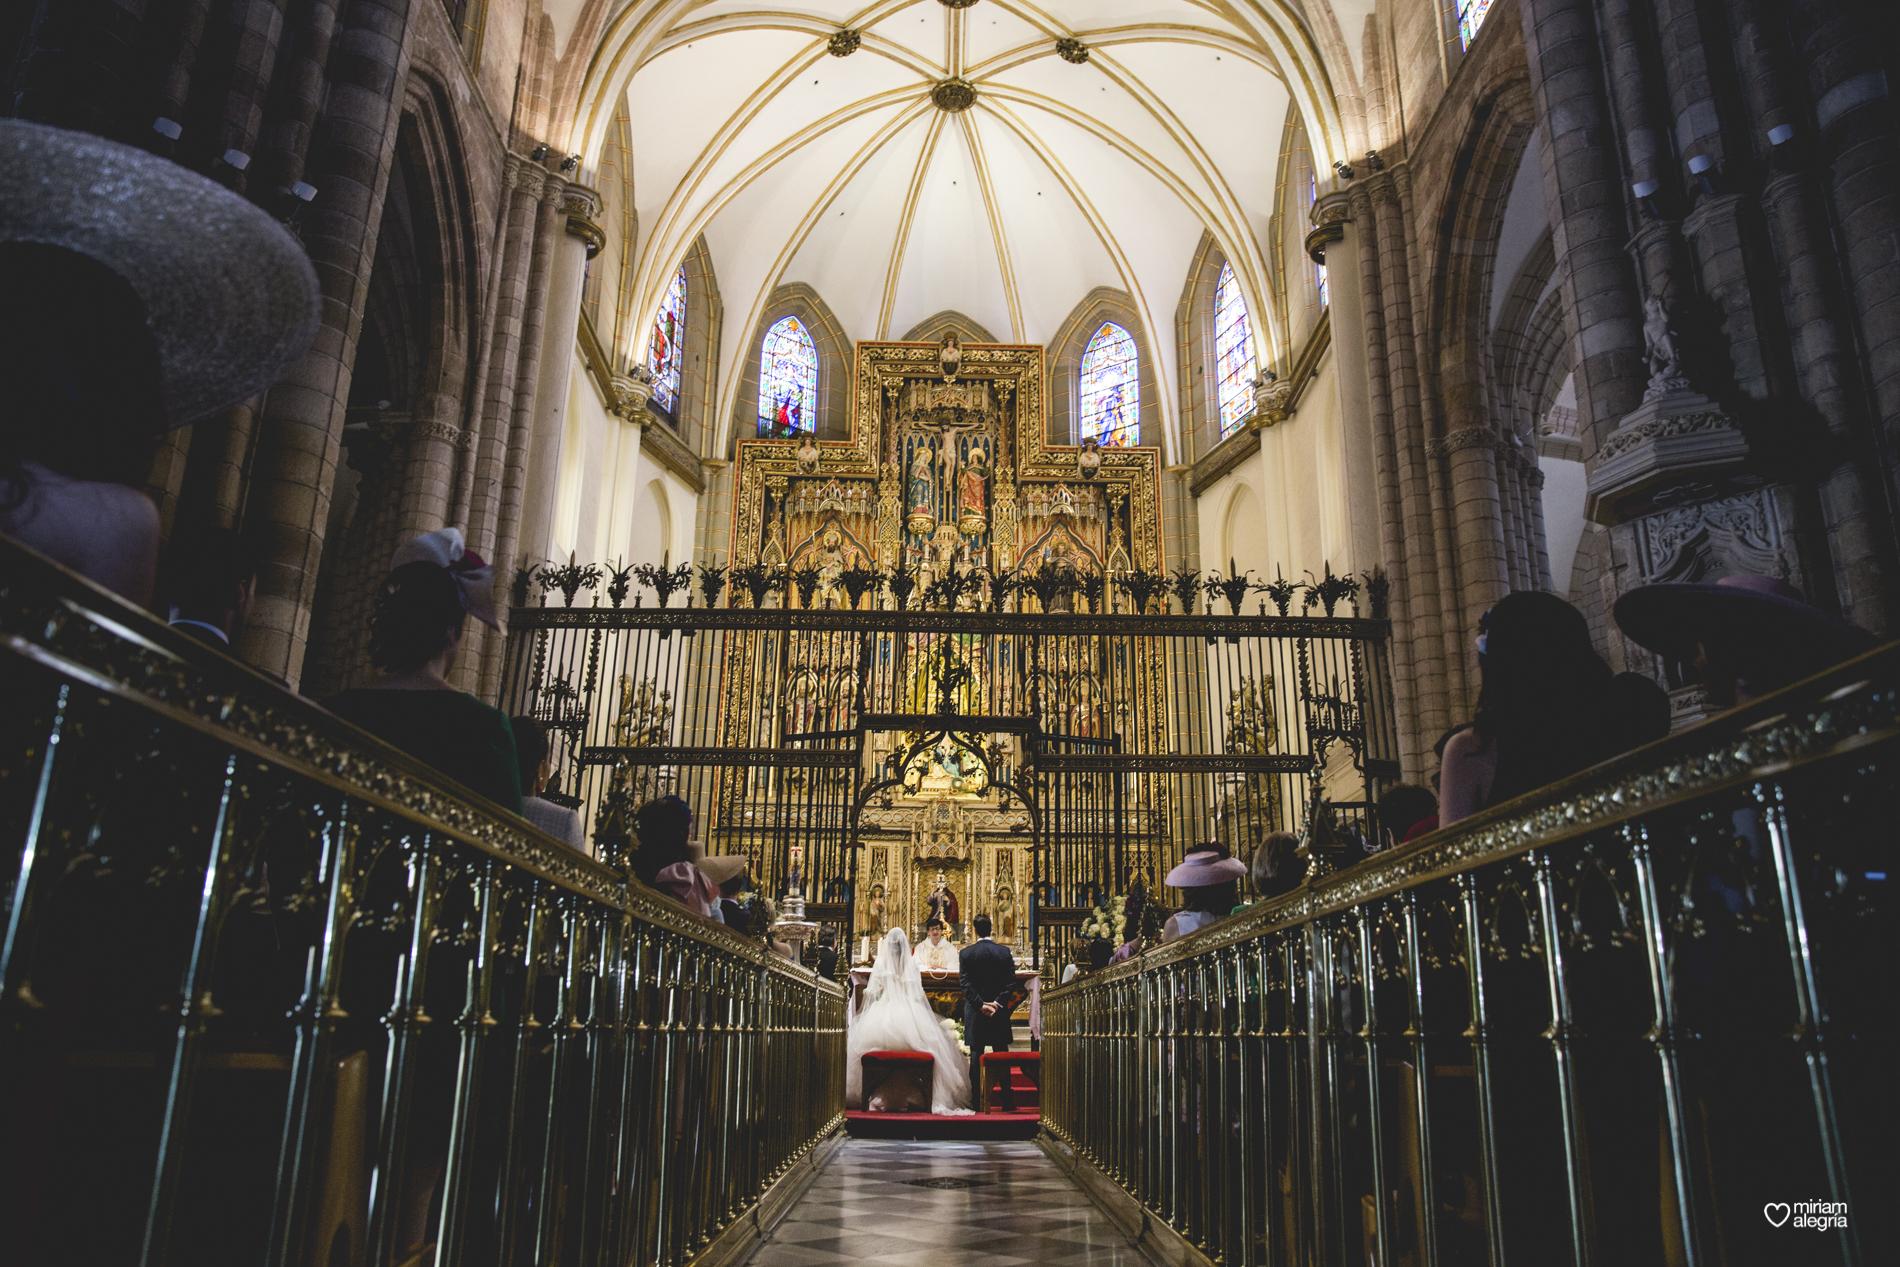 boda-en-la-catedral-de-murcia-miriam-alegria-fotografos-boda-murcia-37